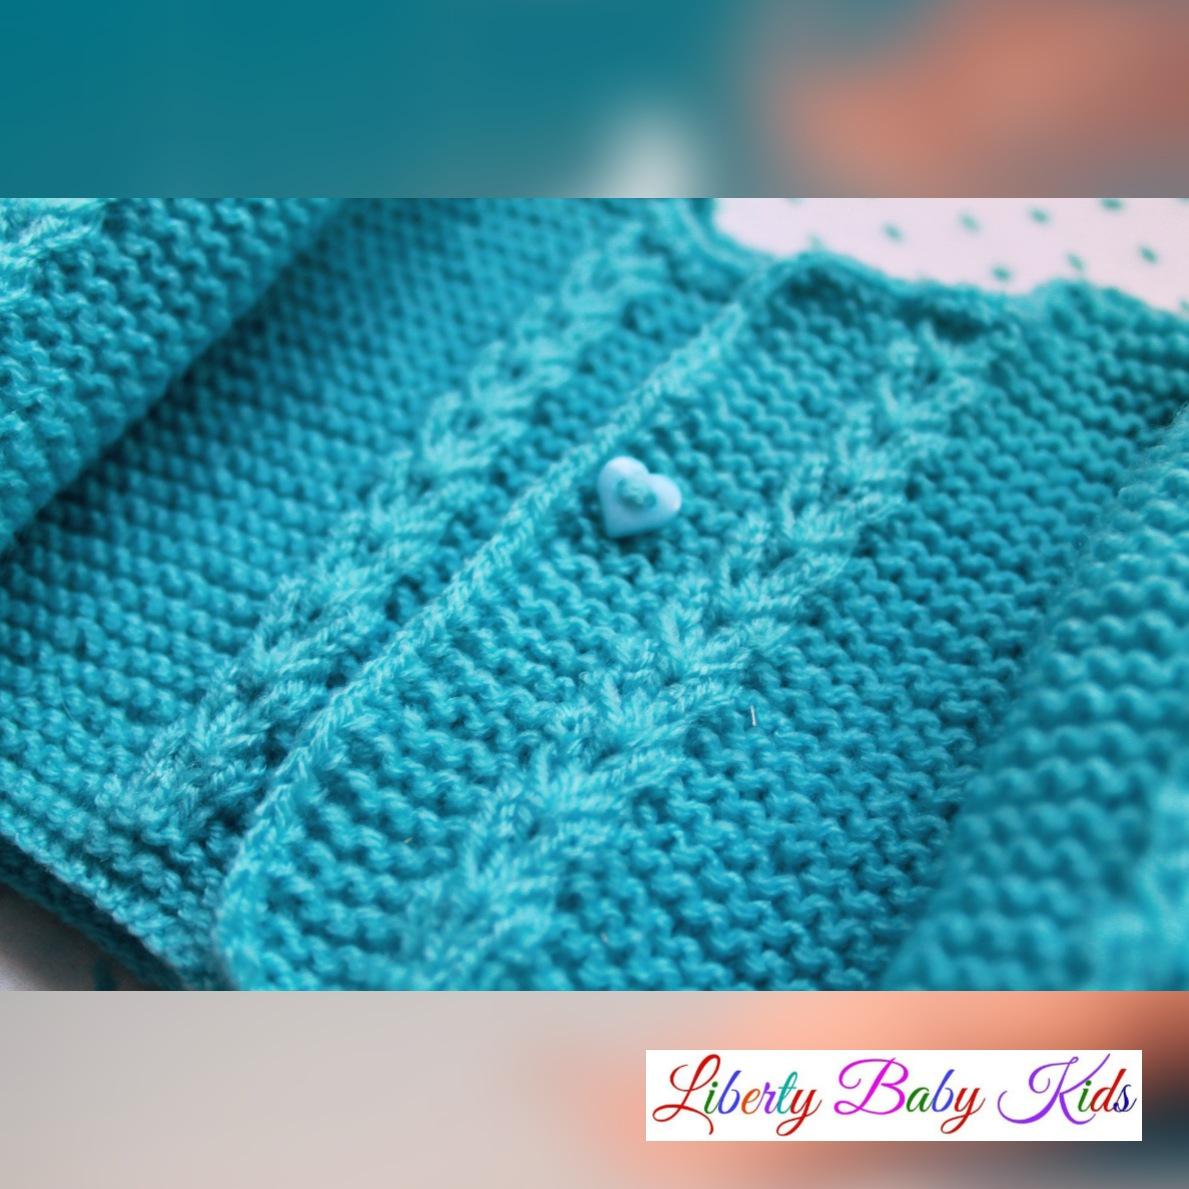 chaqueta-azul-turquesa-liberty-baby-kids-3